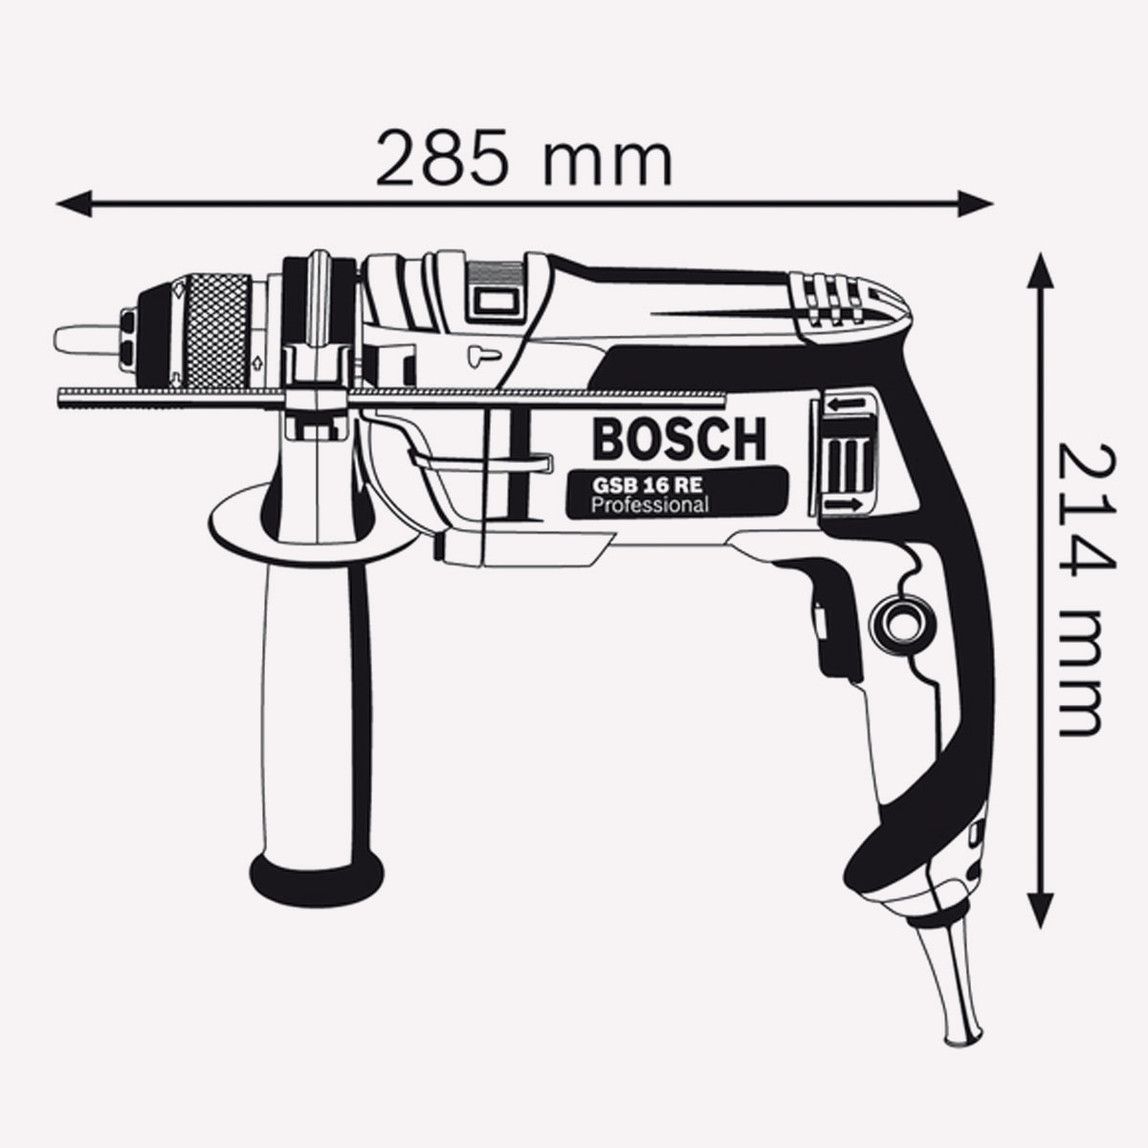 Bosch GSB-16RE Profesyonel 750W 18 mm Darbeli Matkap